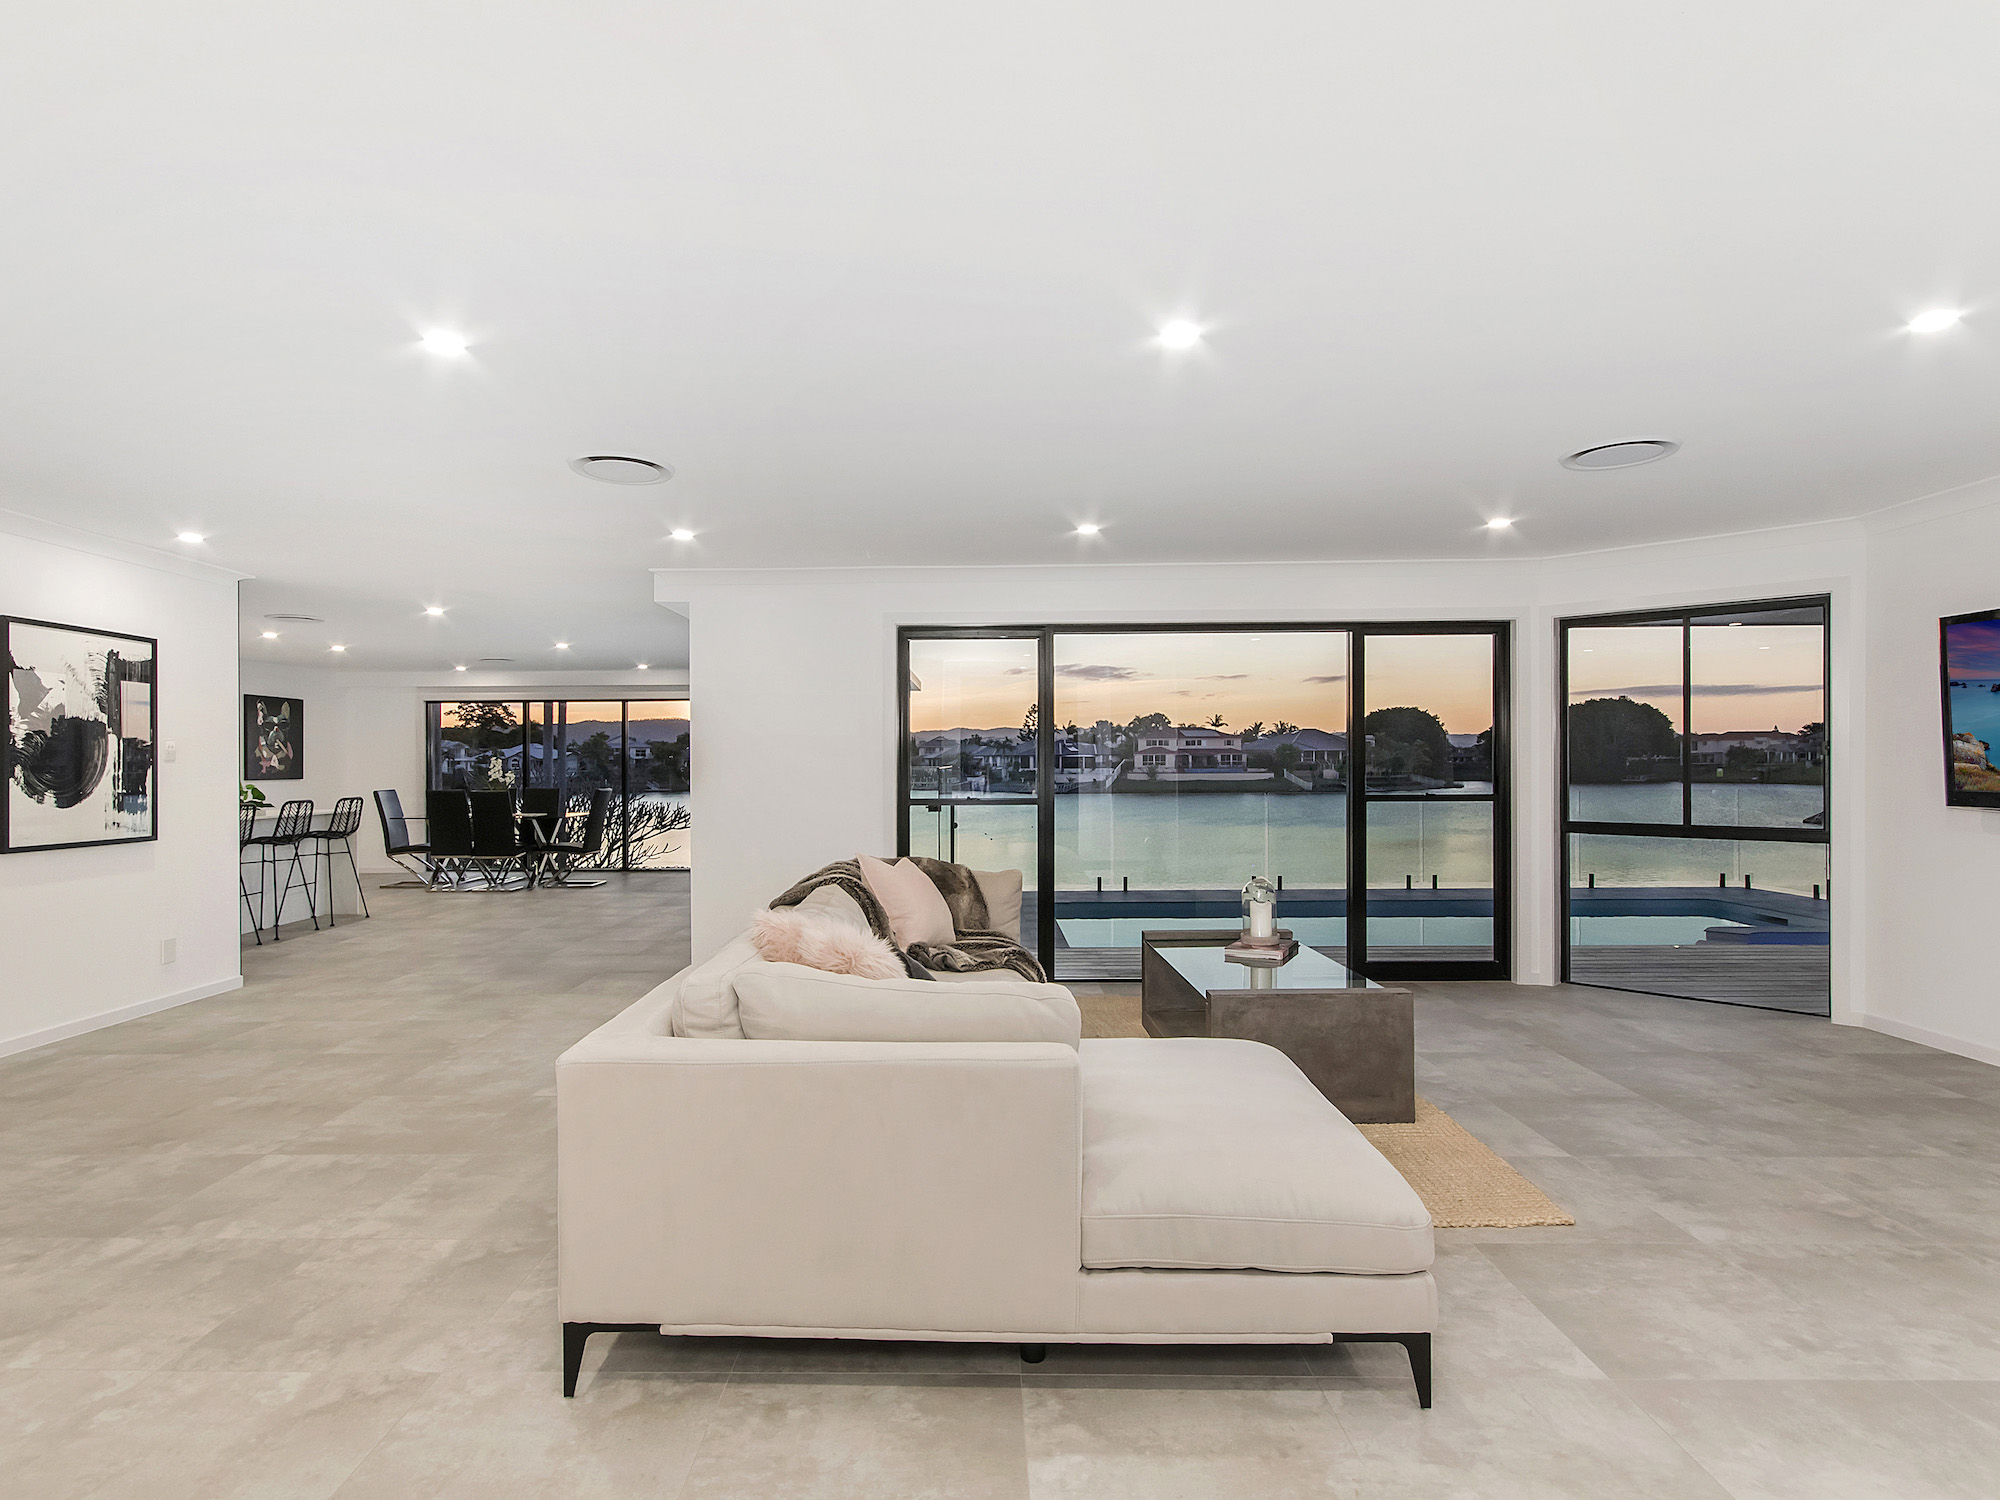 Open plan living with concrete tiles, minimalistic living area